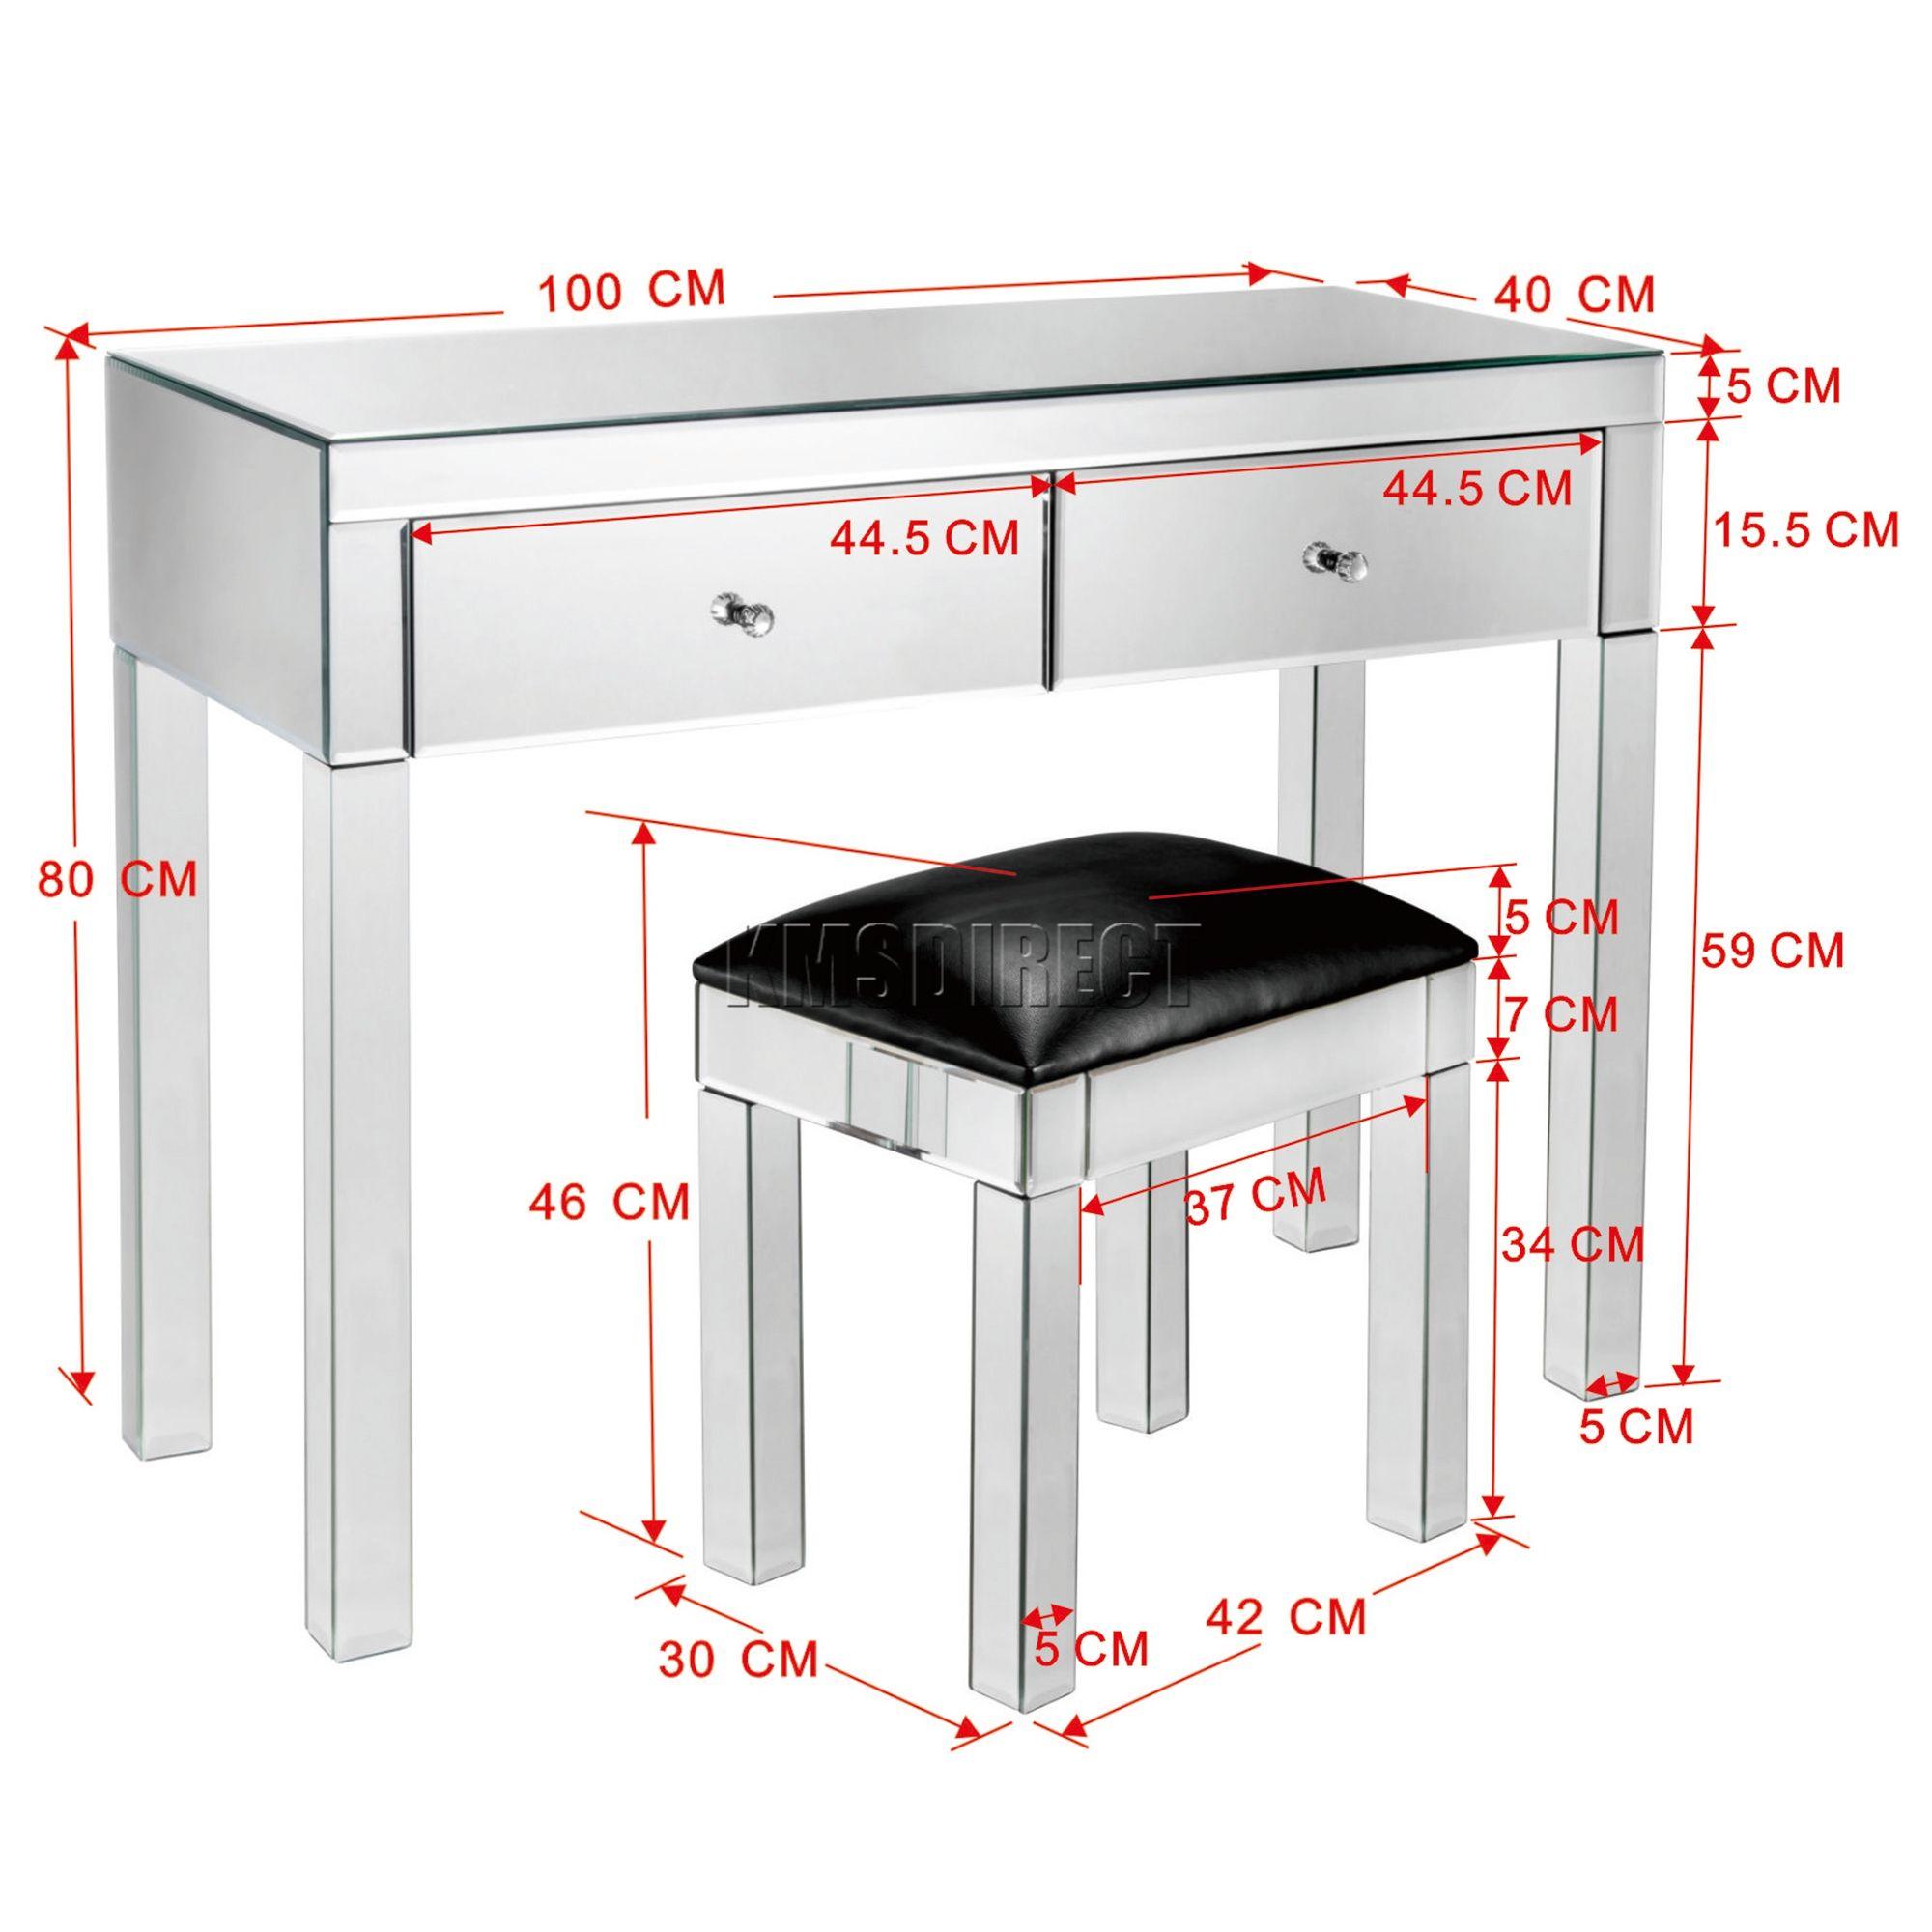 Dressing Room Mirror Dimensions Designs Dressing Table Design Makeup Table Vanity Dressing Room Mirror